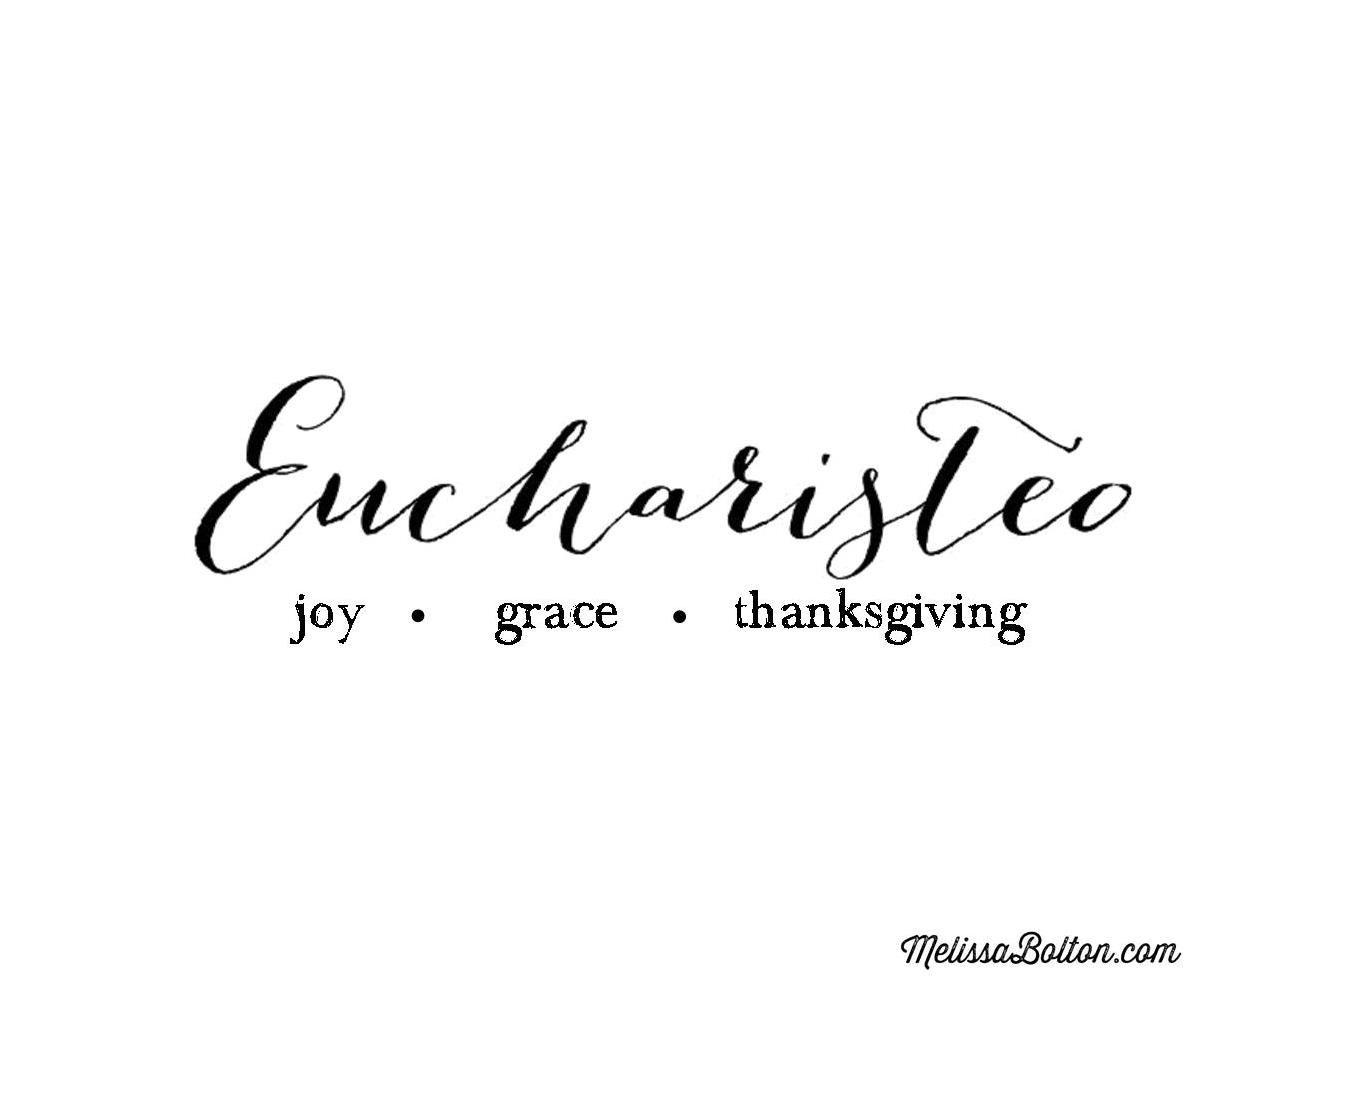 Eucharisteo, thanksgiving, envelops the Greek word for ...